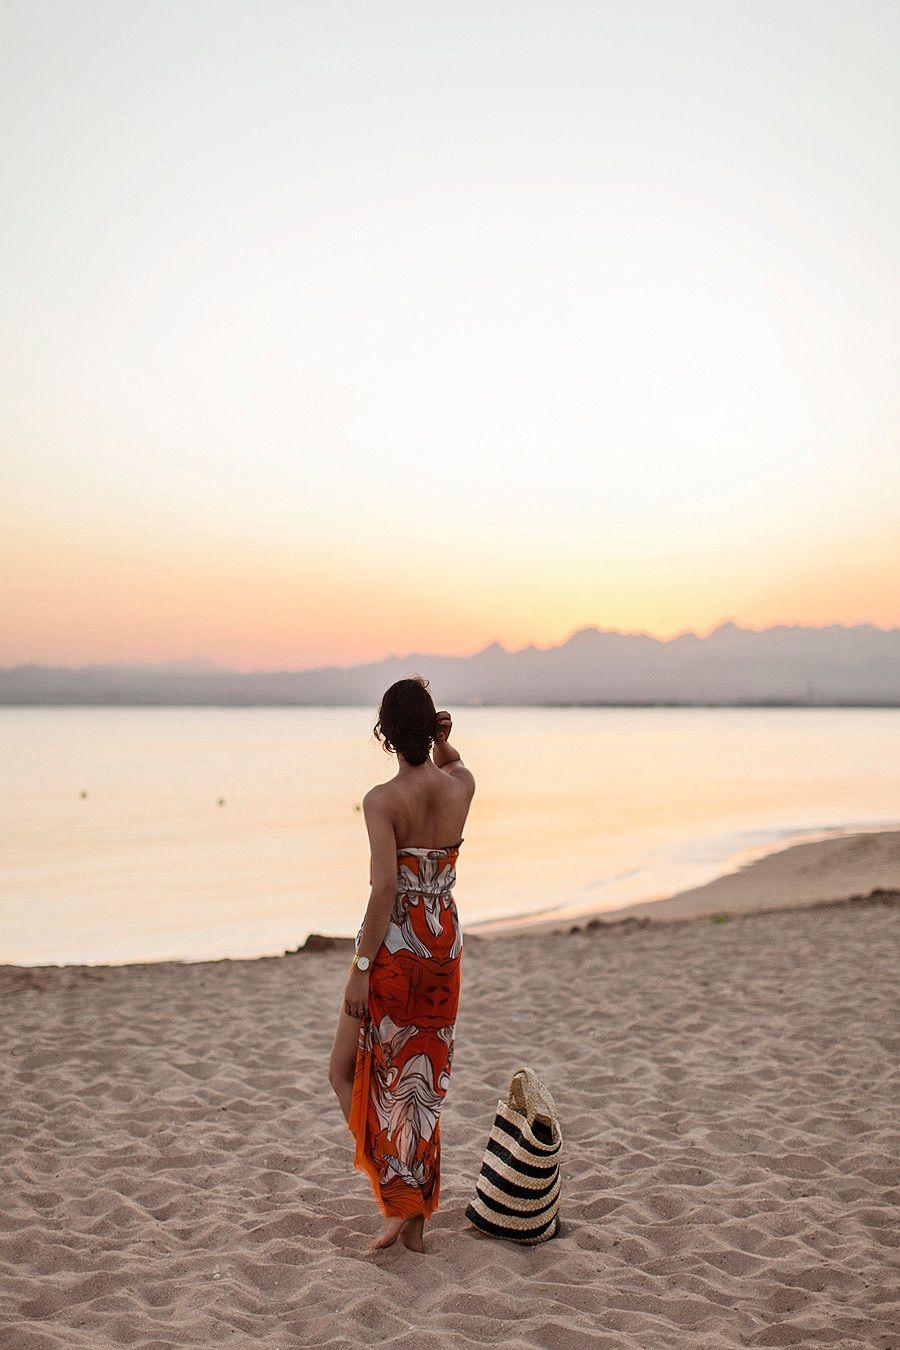 #KempinskiSomaBay #girls #life #lifeisgood #sea #lifestyle #dreamlifestyle #travel #dream #happiness #dreamlifestyle #happylife #happiness